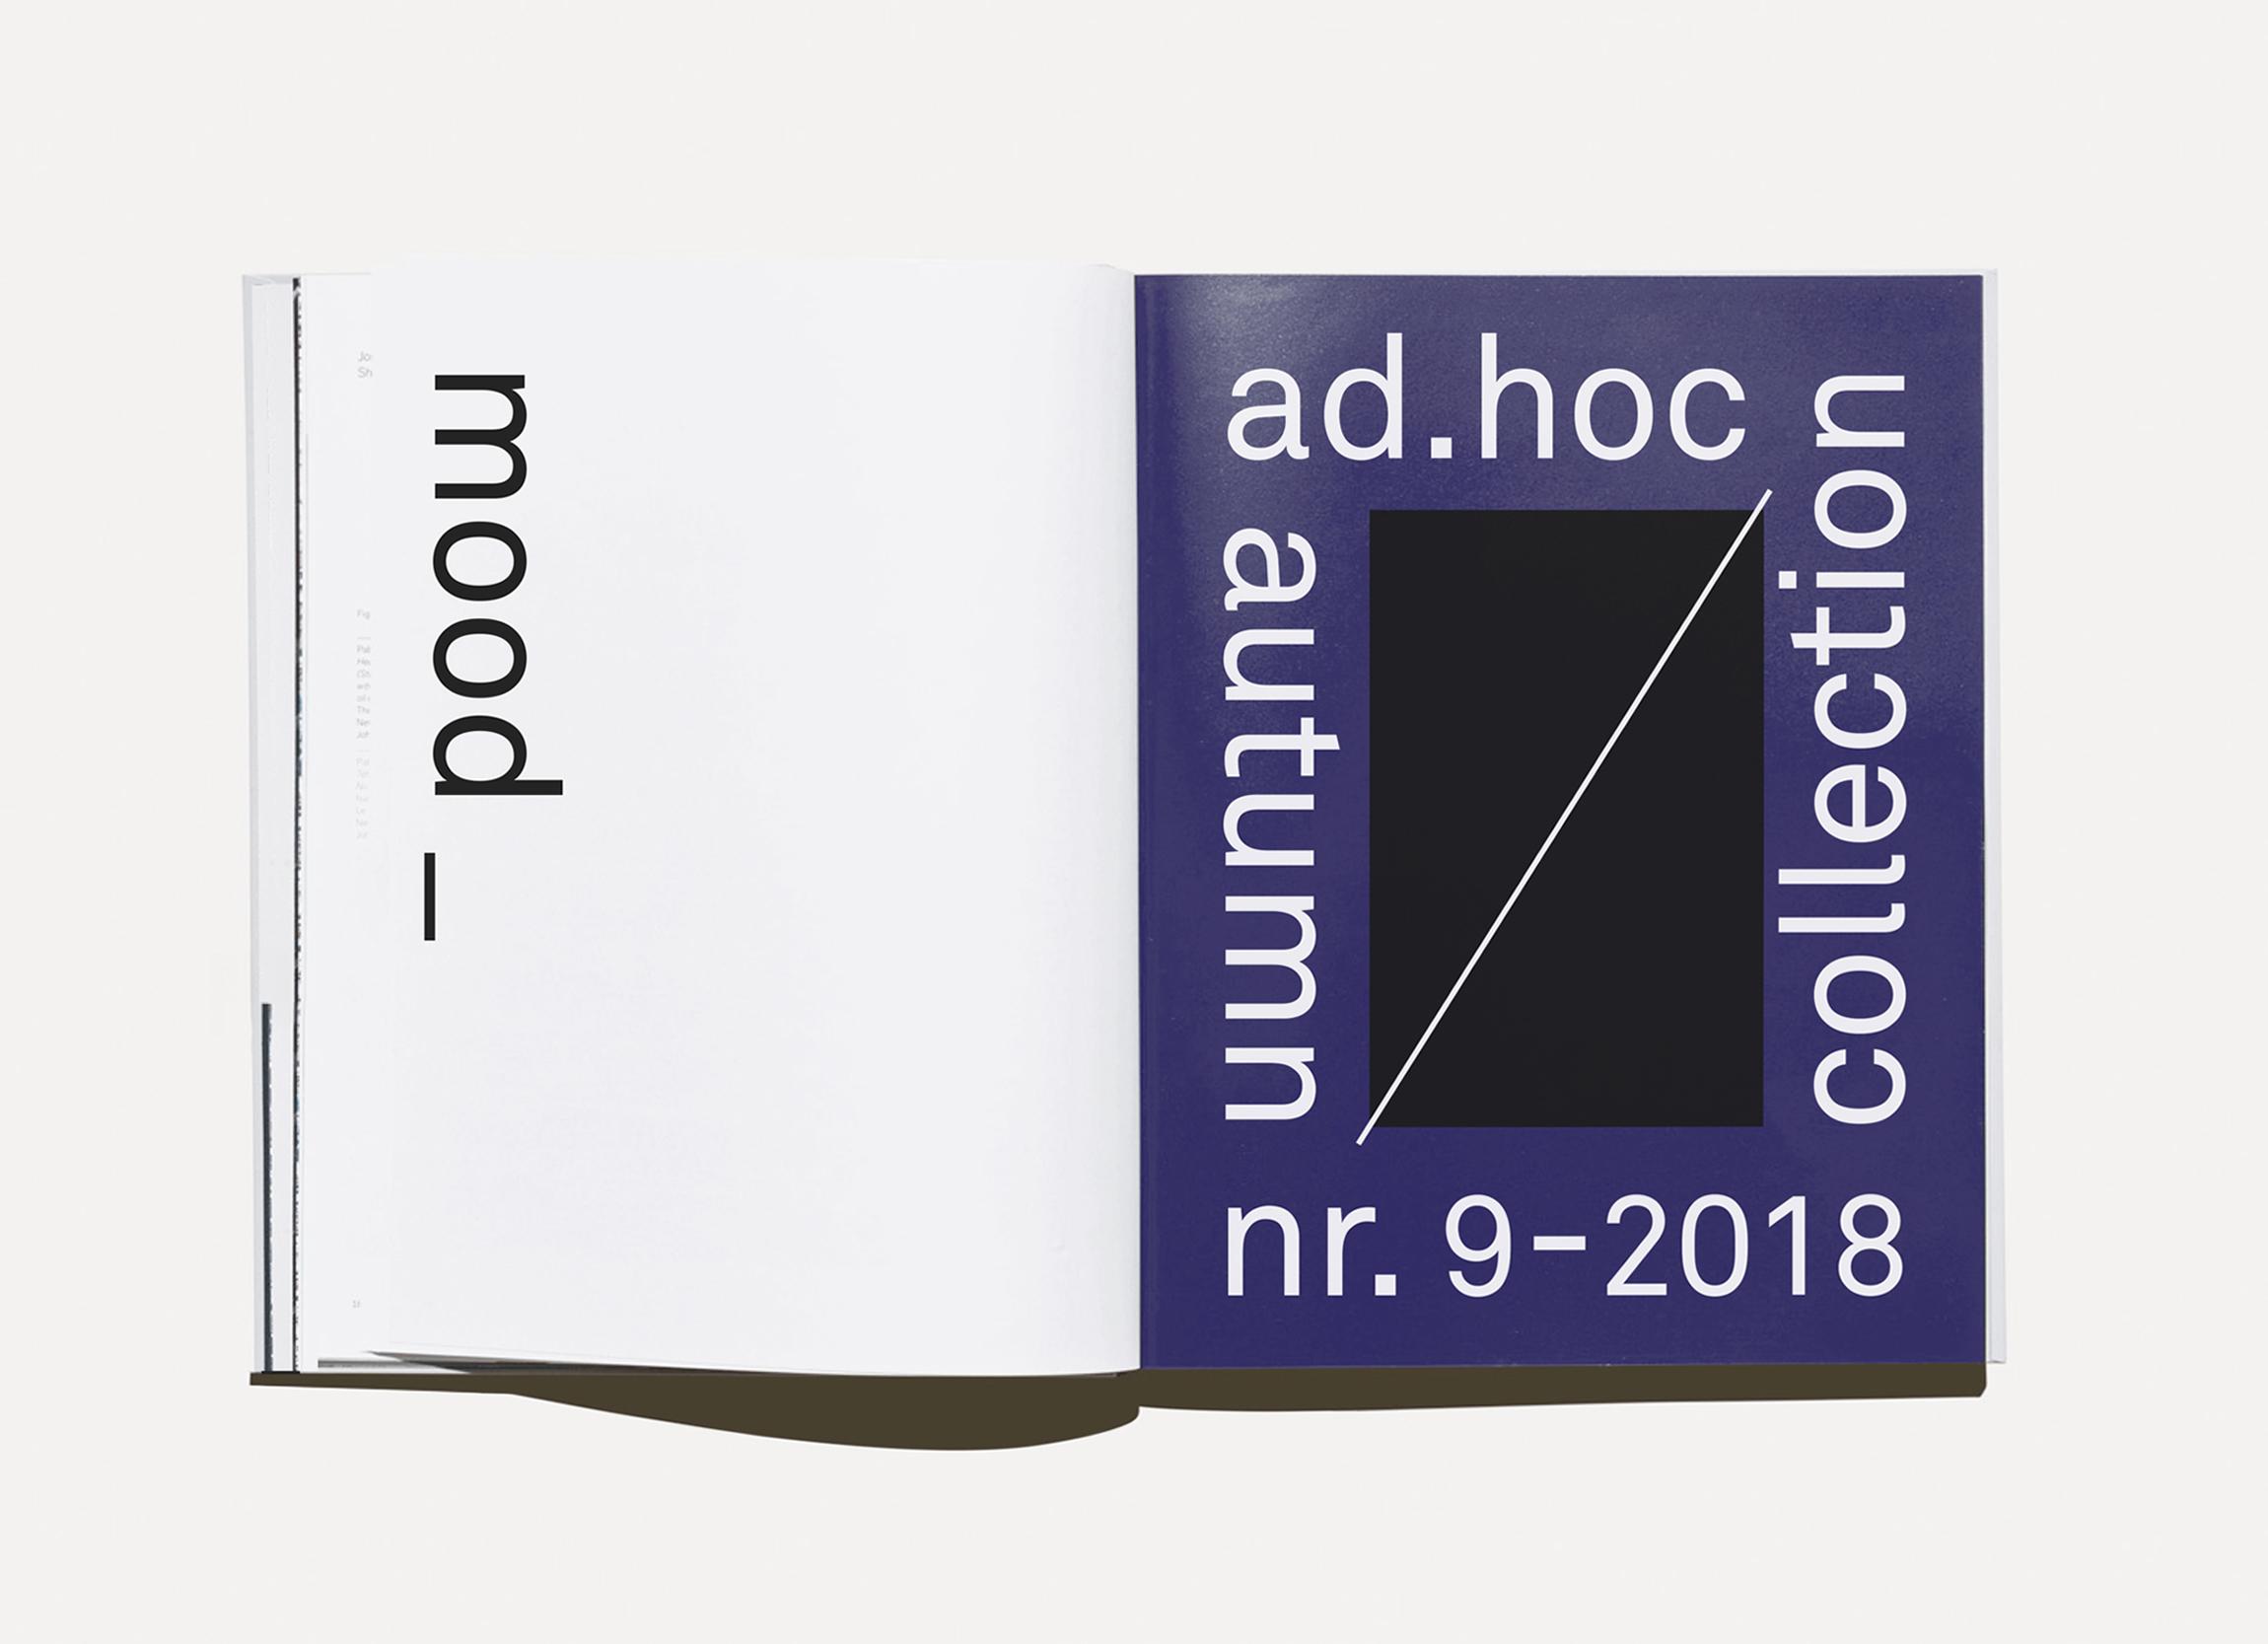 ad.hoc_web01